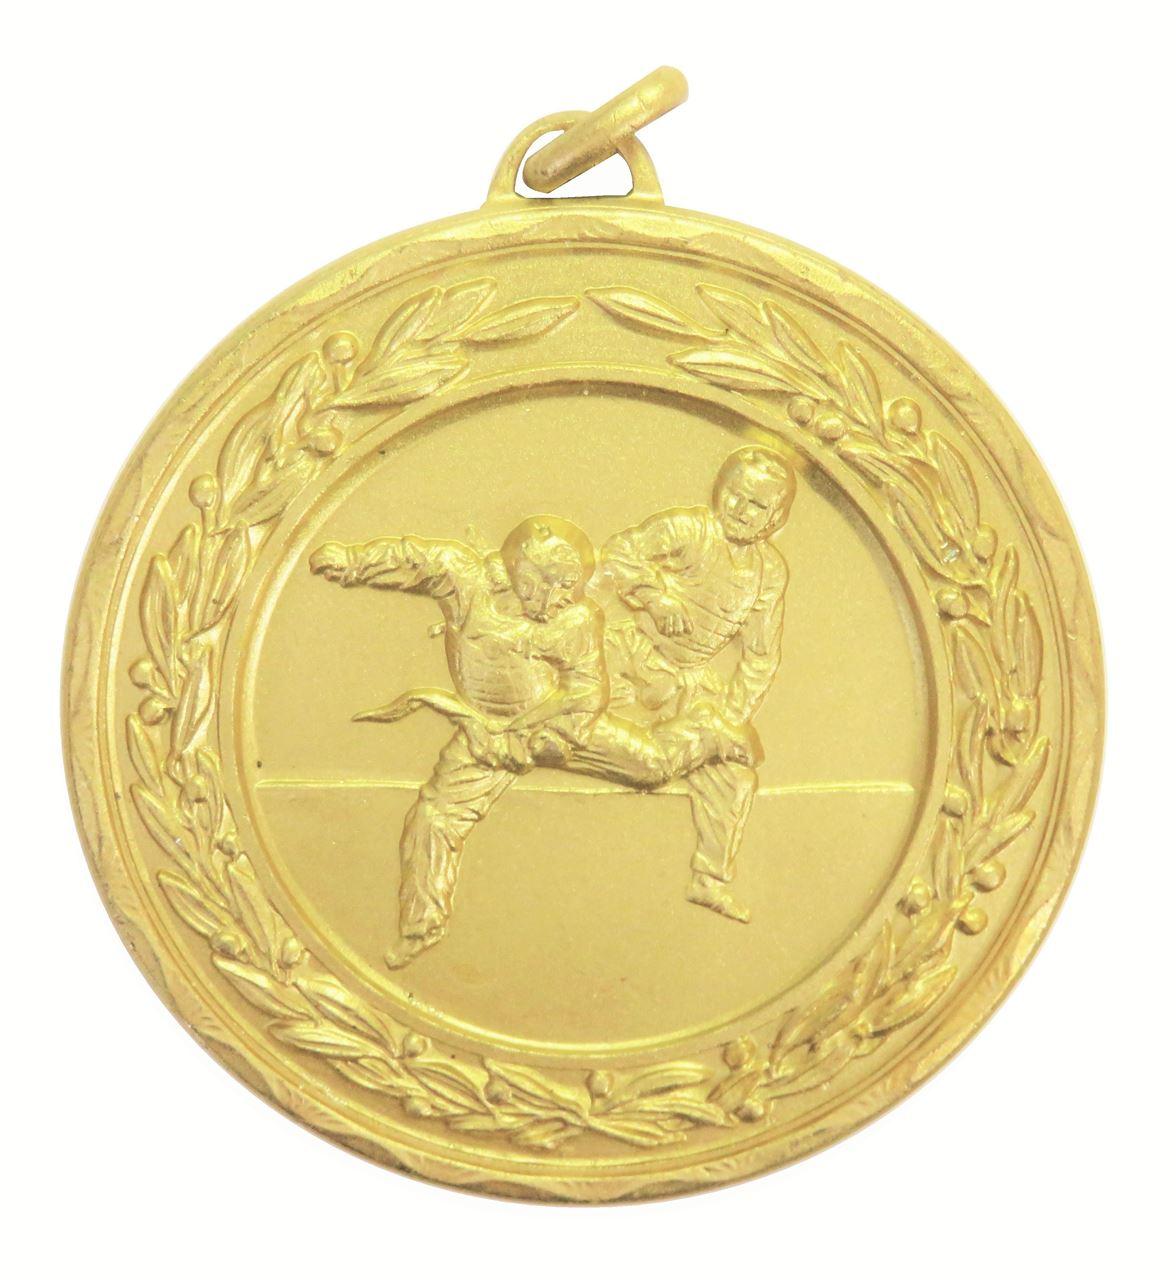 Gold Laurel Economy Martial Arts Medal (size: 50mm) - 4205E